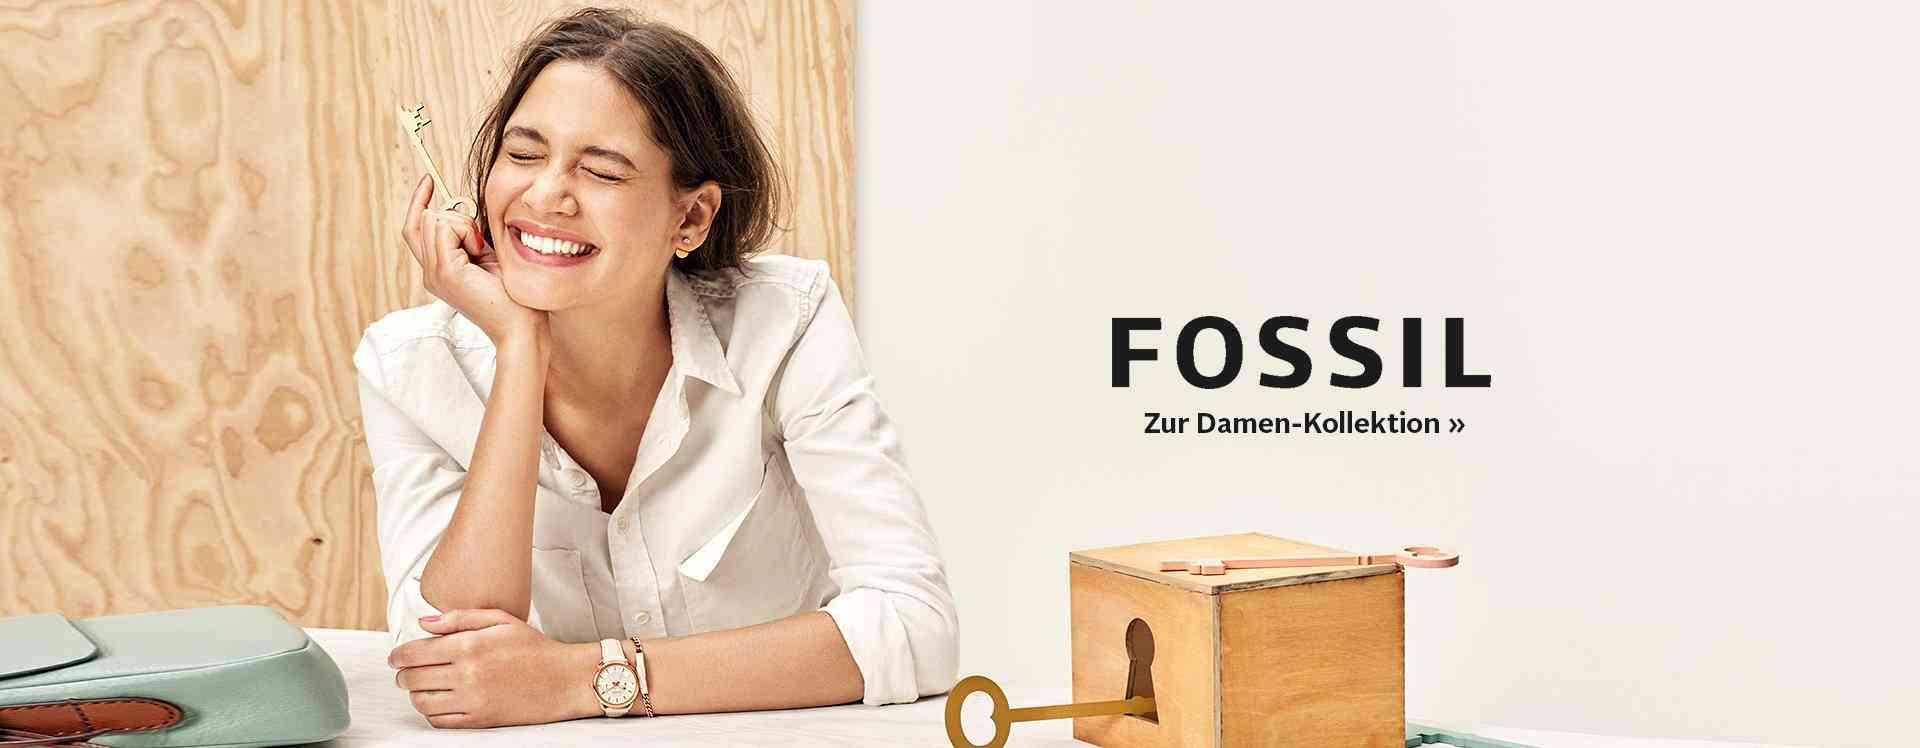 Damenmode von Fossil - cooler Vintage Look!